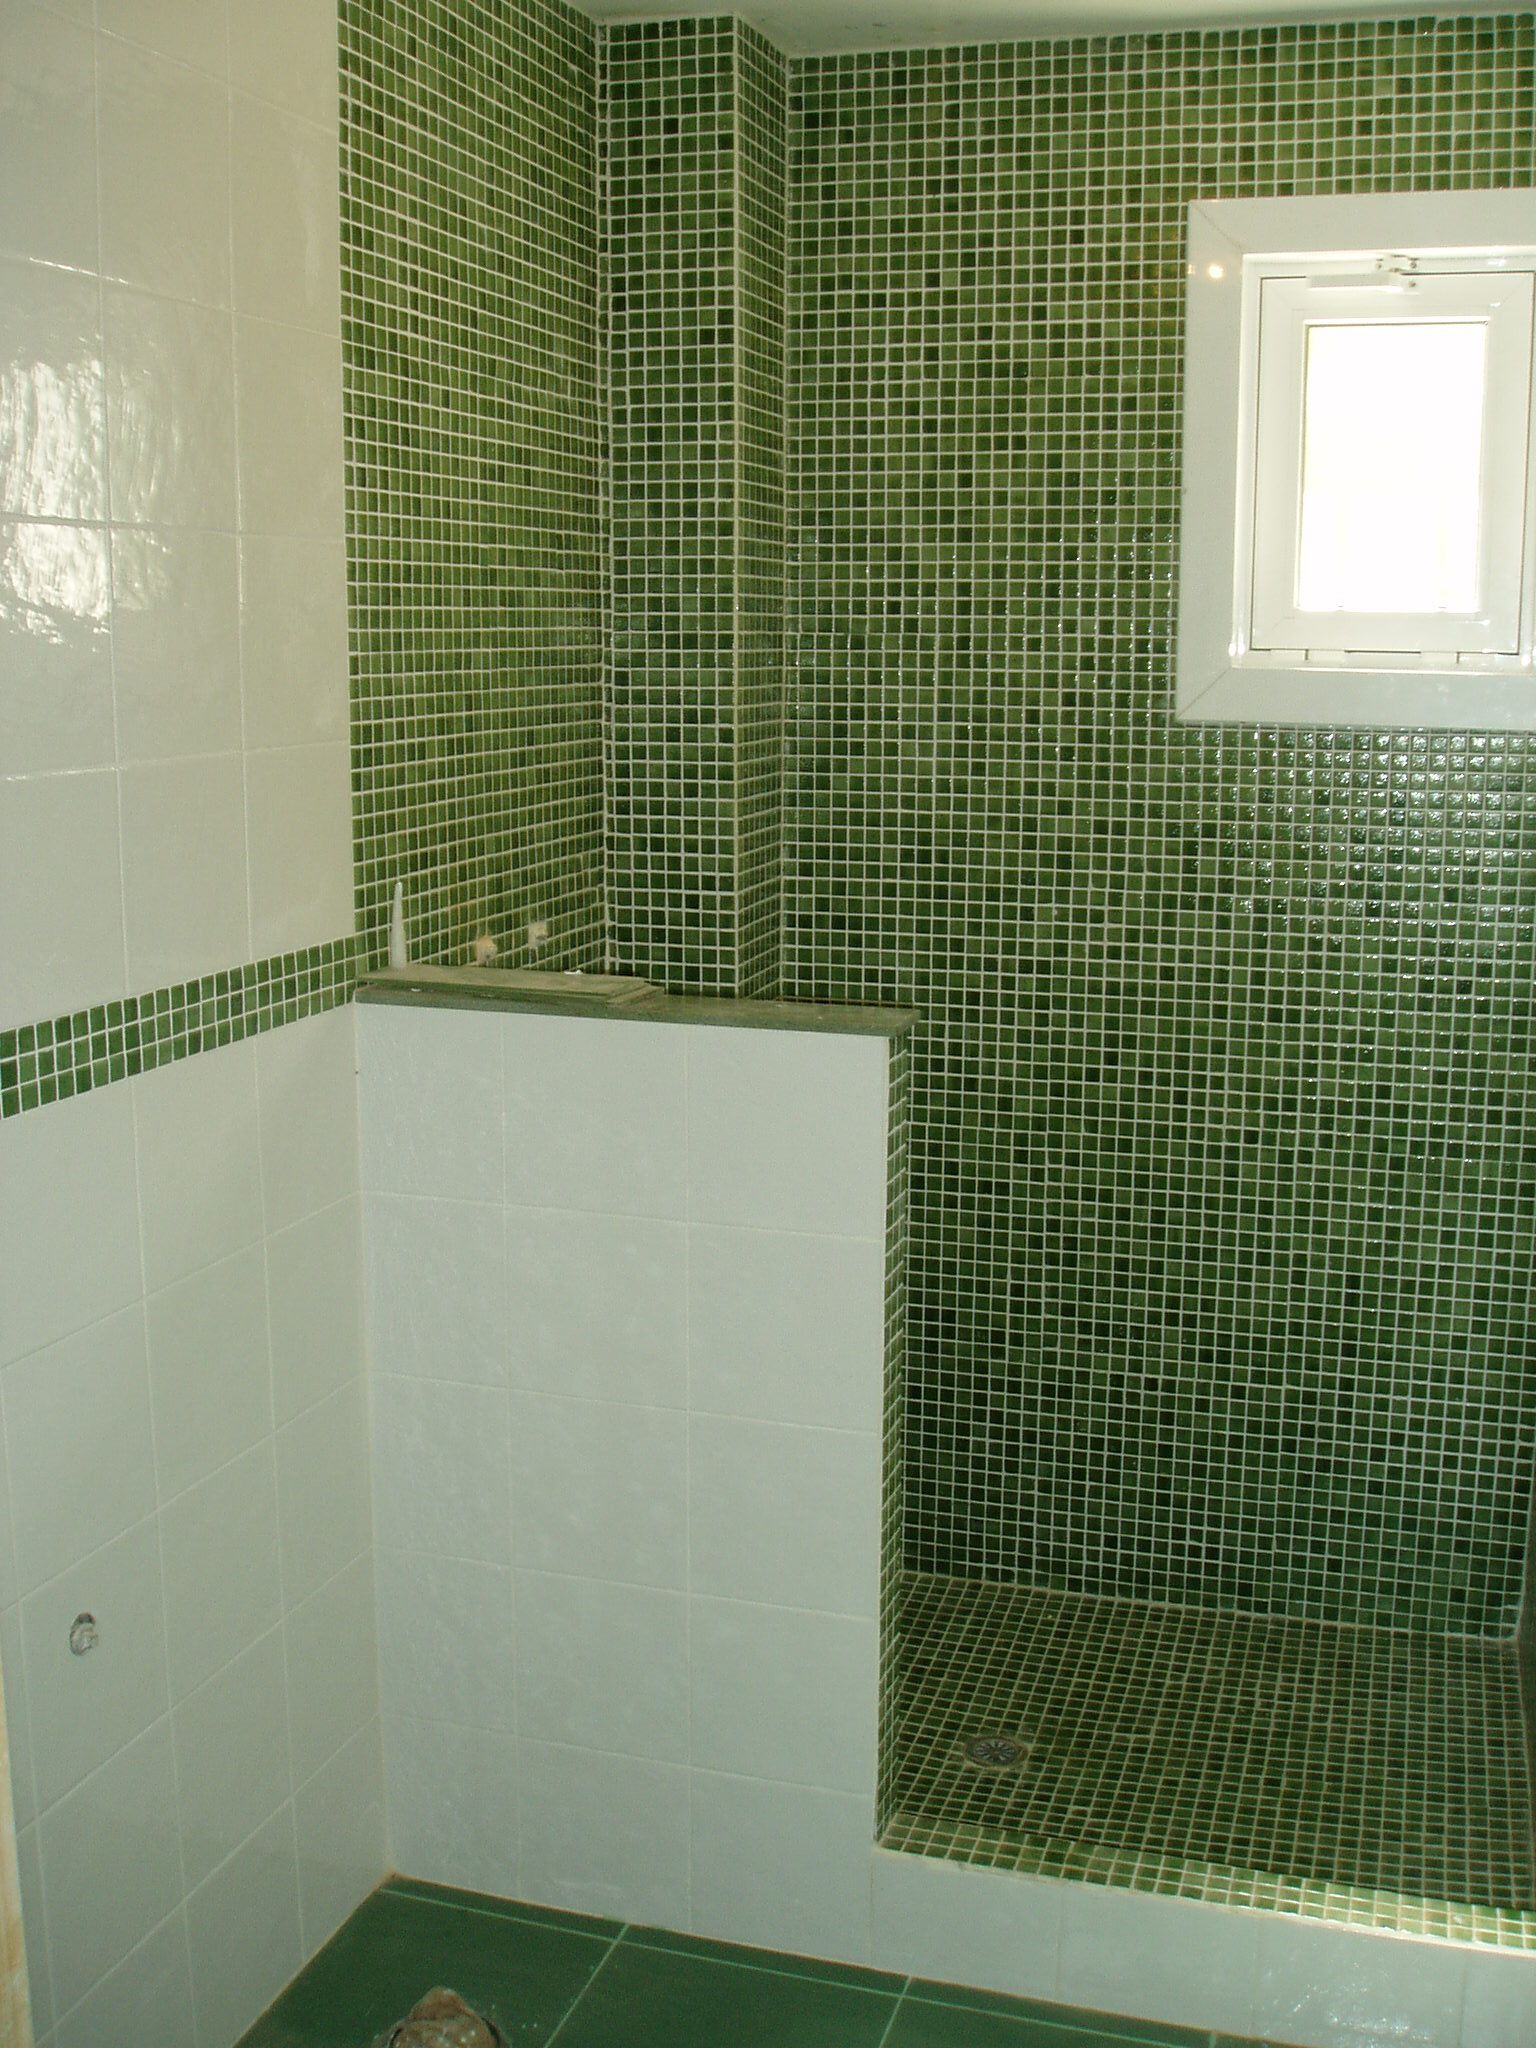 Ba o gresite verde en combinaci n con azulejo blanco - Bano azulejo blanco ...